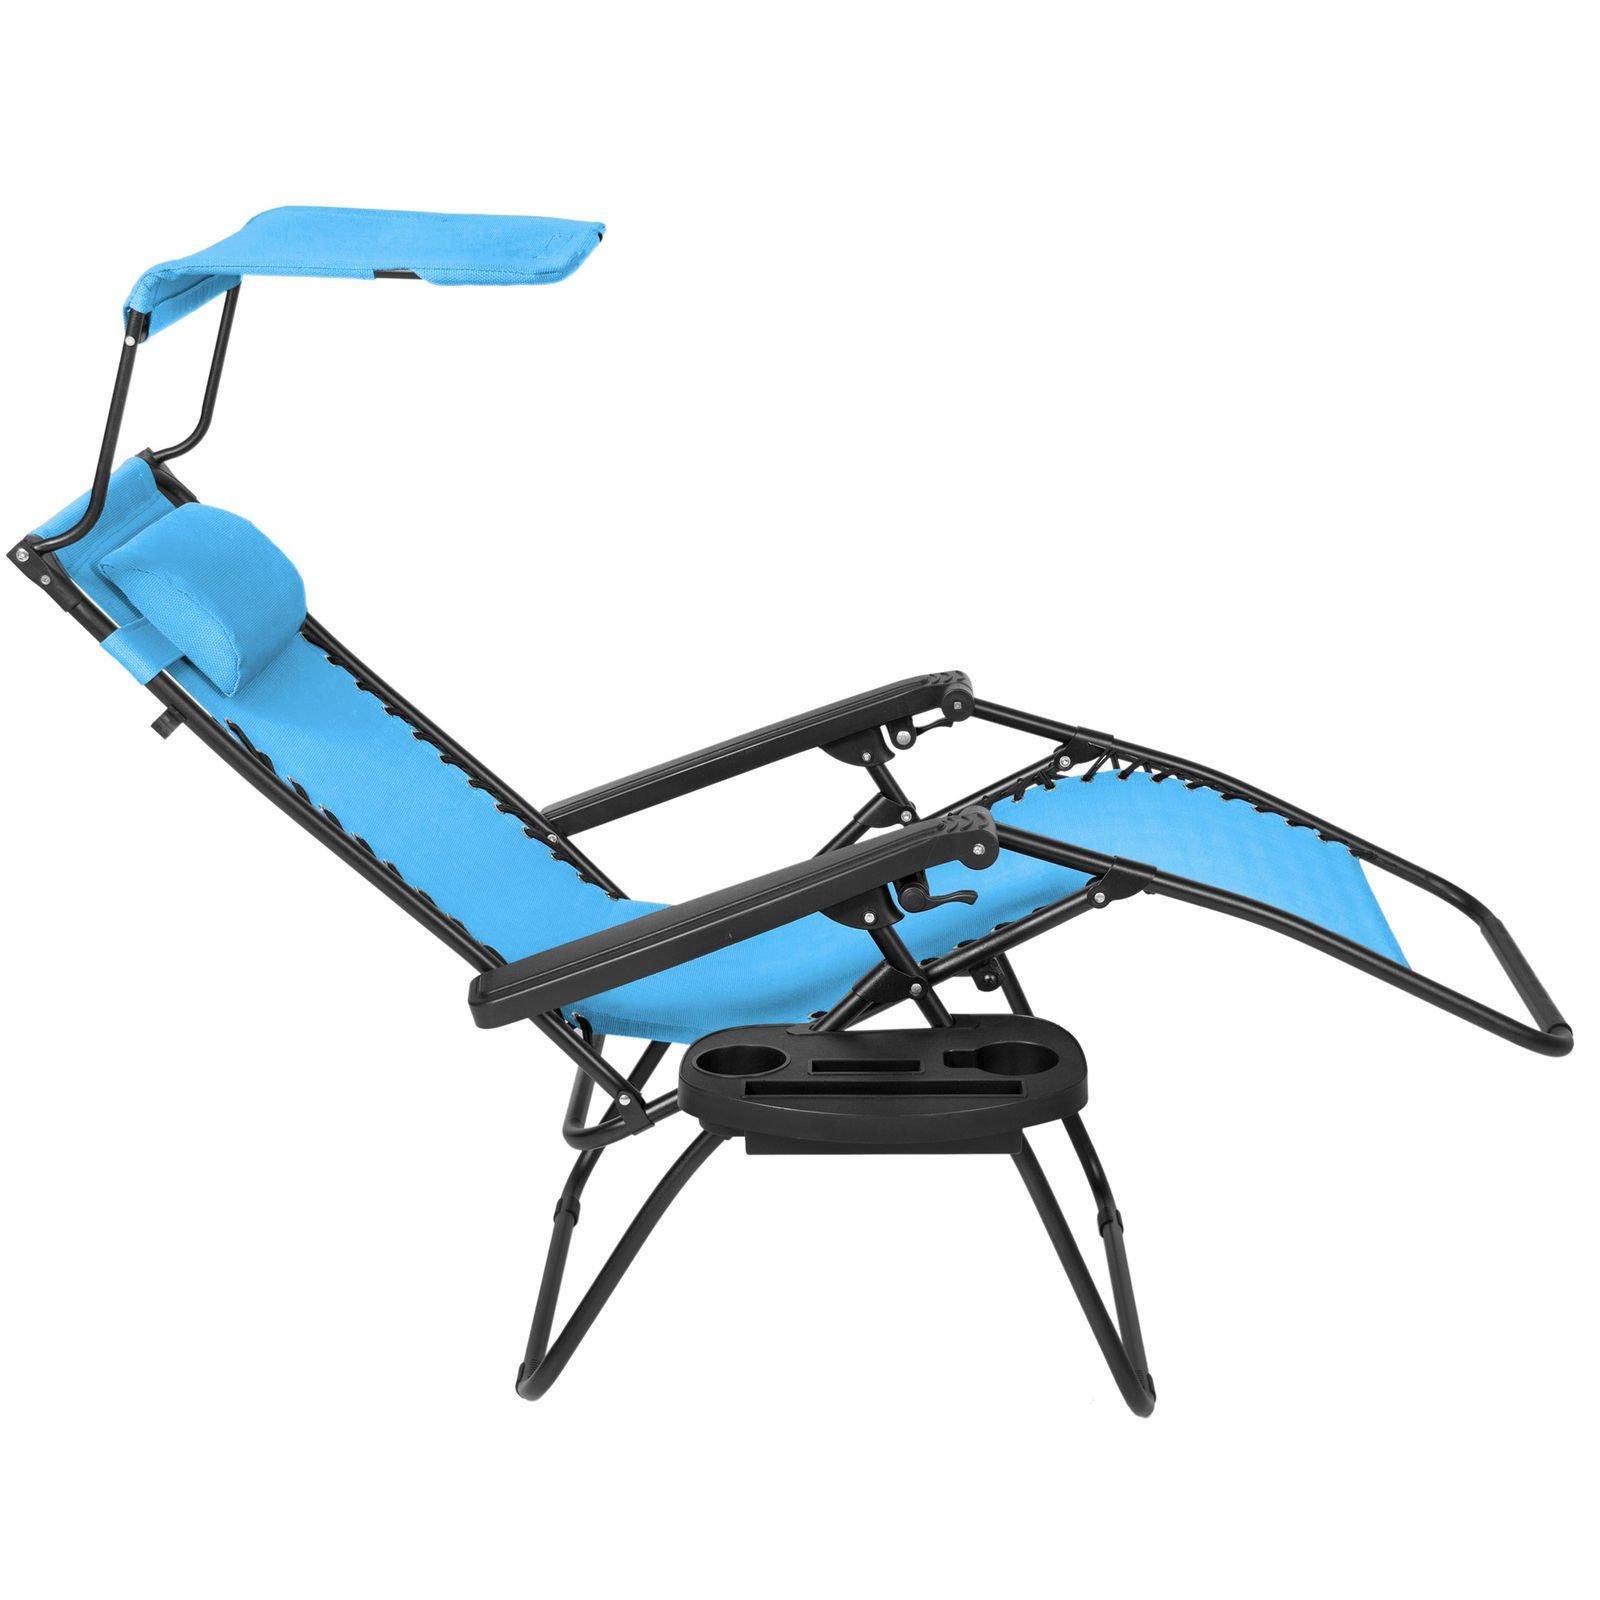 NEW Blue, Folding Zero Gravity Lounge Chair W/ Canopy & Magazine Cup Holder-Light